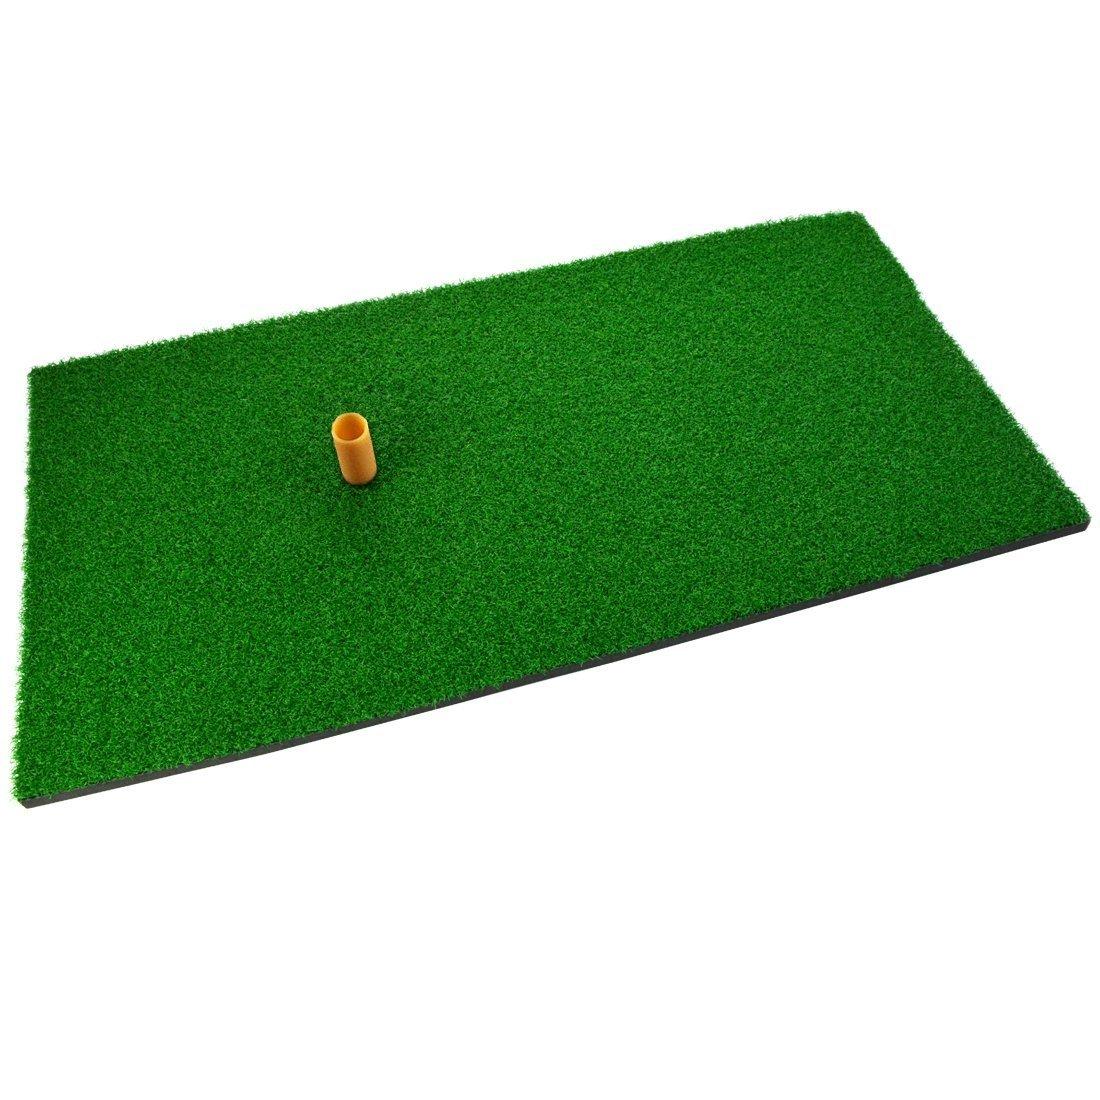 Sumersha Golf Mat 12''x36'' Residential Practice Hitting Mat Rubber Tee Holder